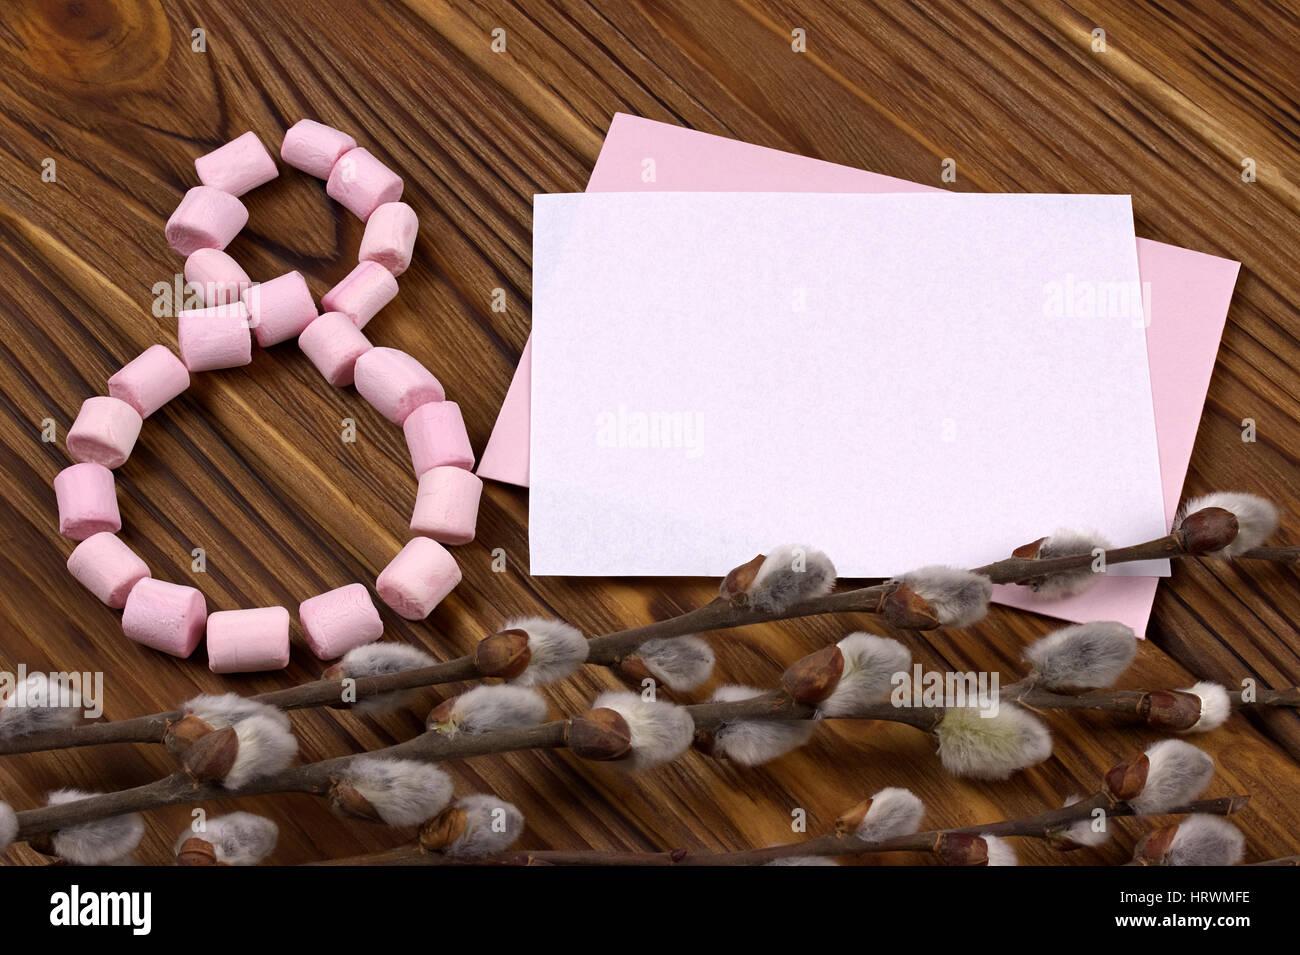 Happy Birthday Text Flowers Stockfotos & Happy Birthday